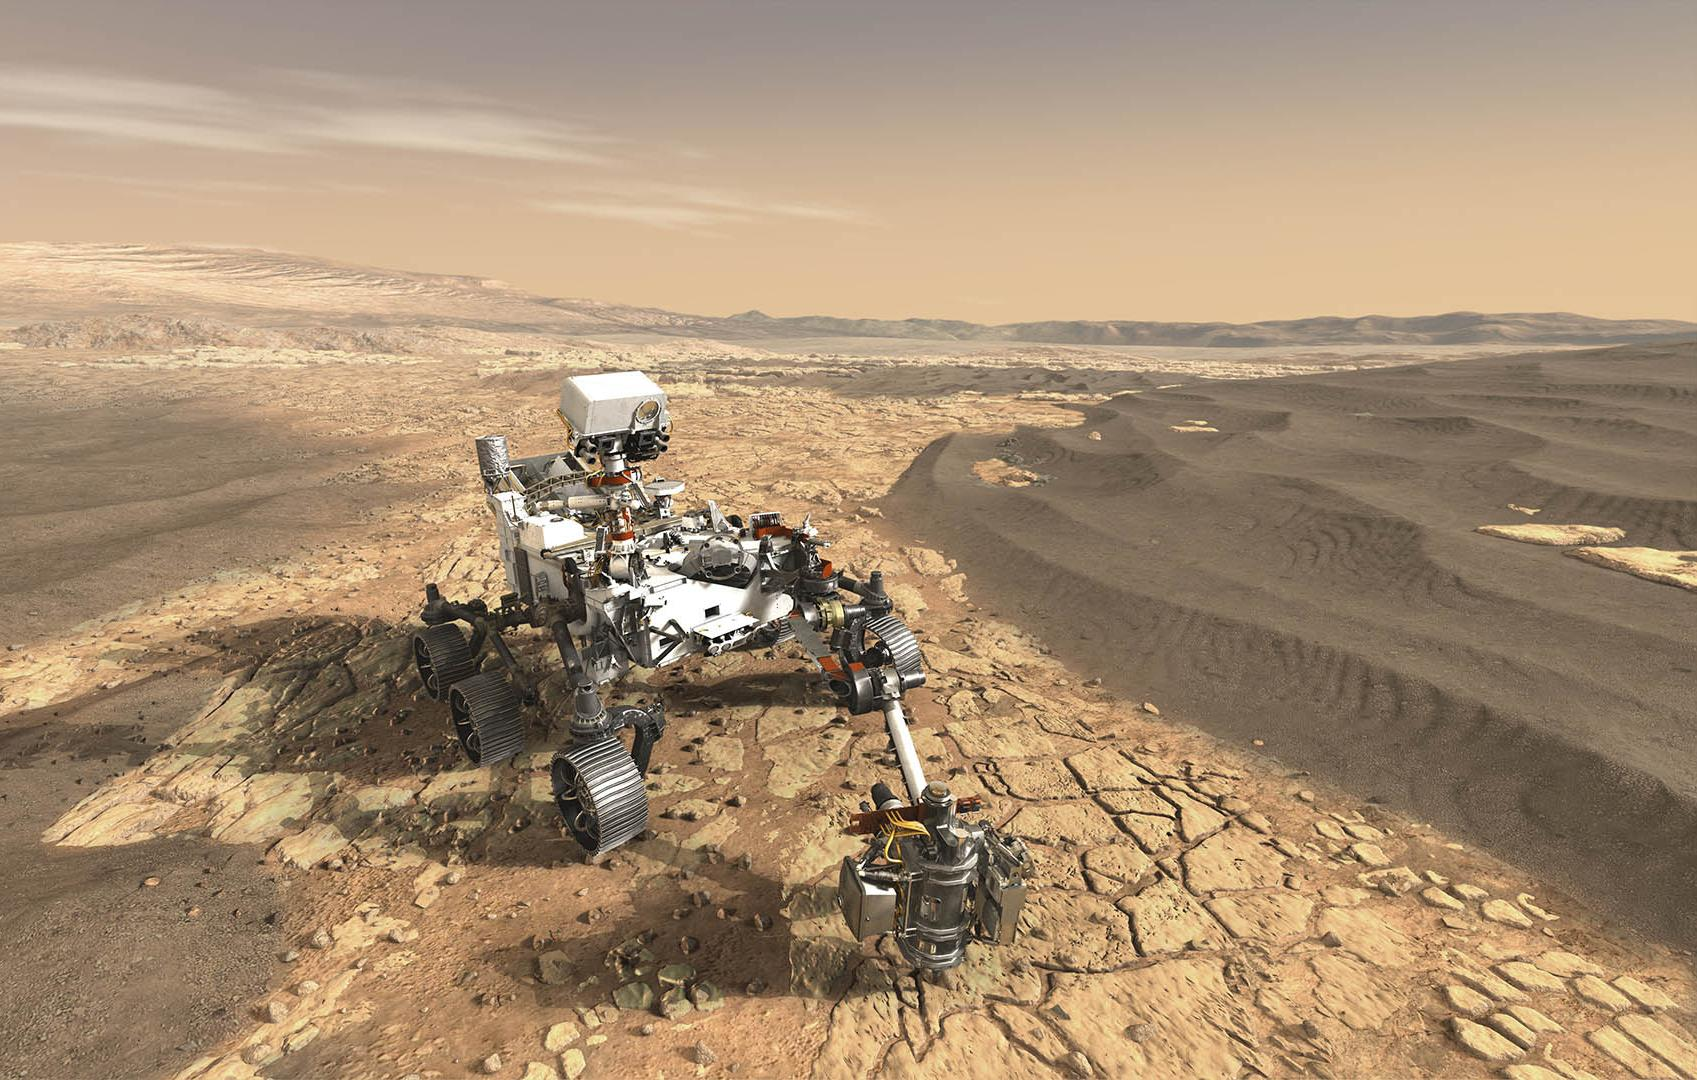 Rover Perseverance recueillera des échantillons de sol de Mars, qui seront récupérés par la mission Mars Sample Return.  Image: NASA